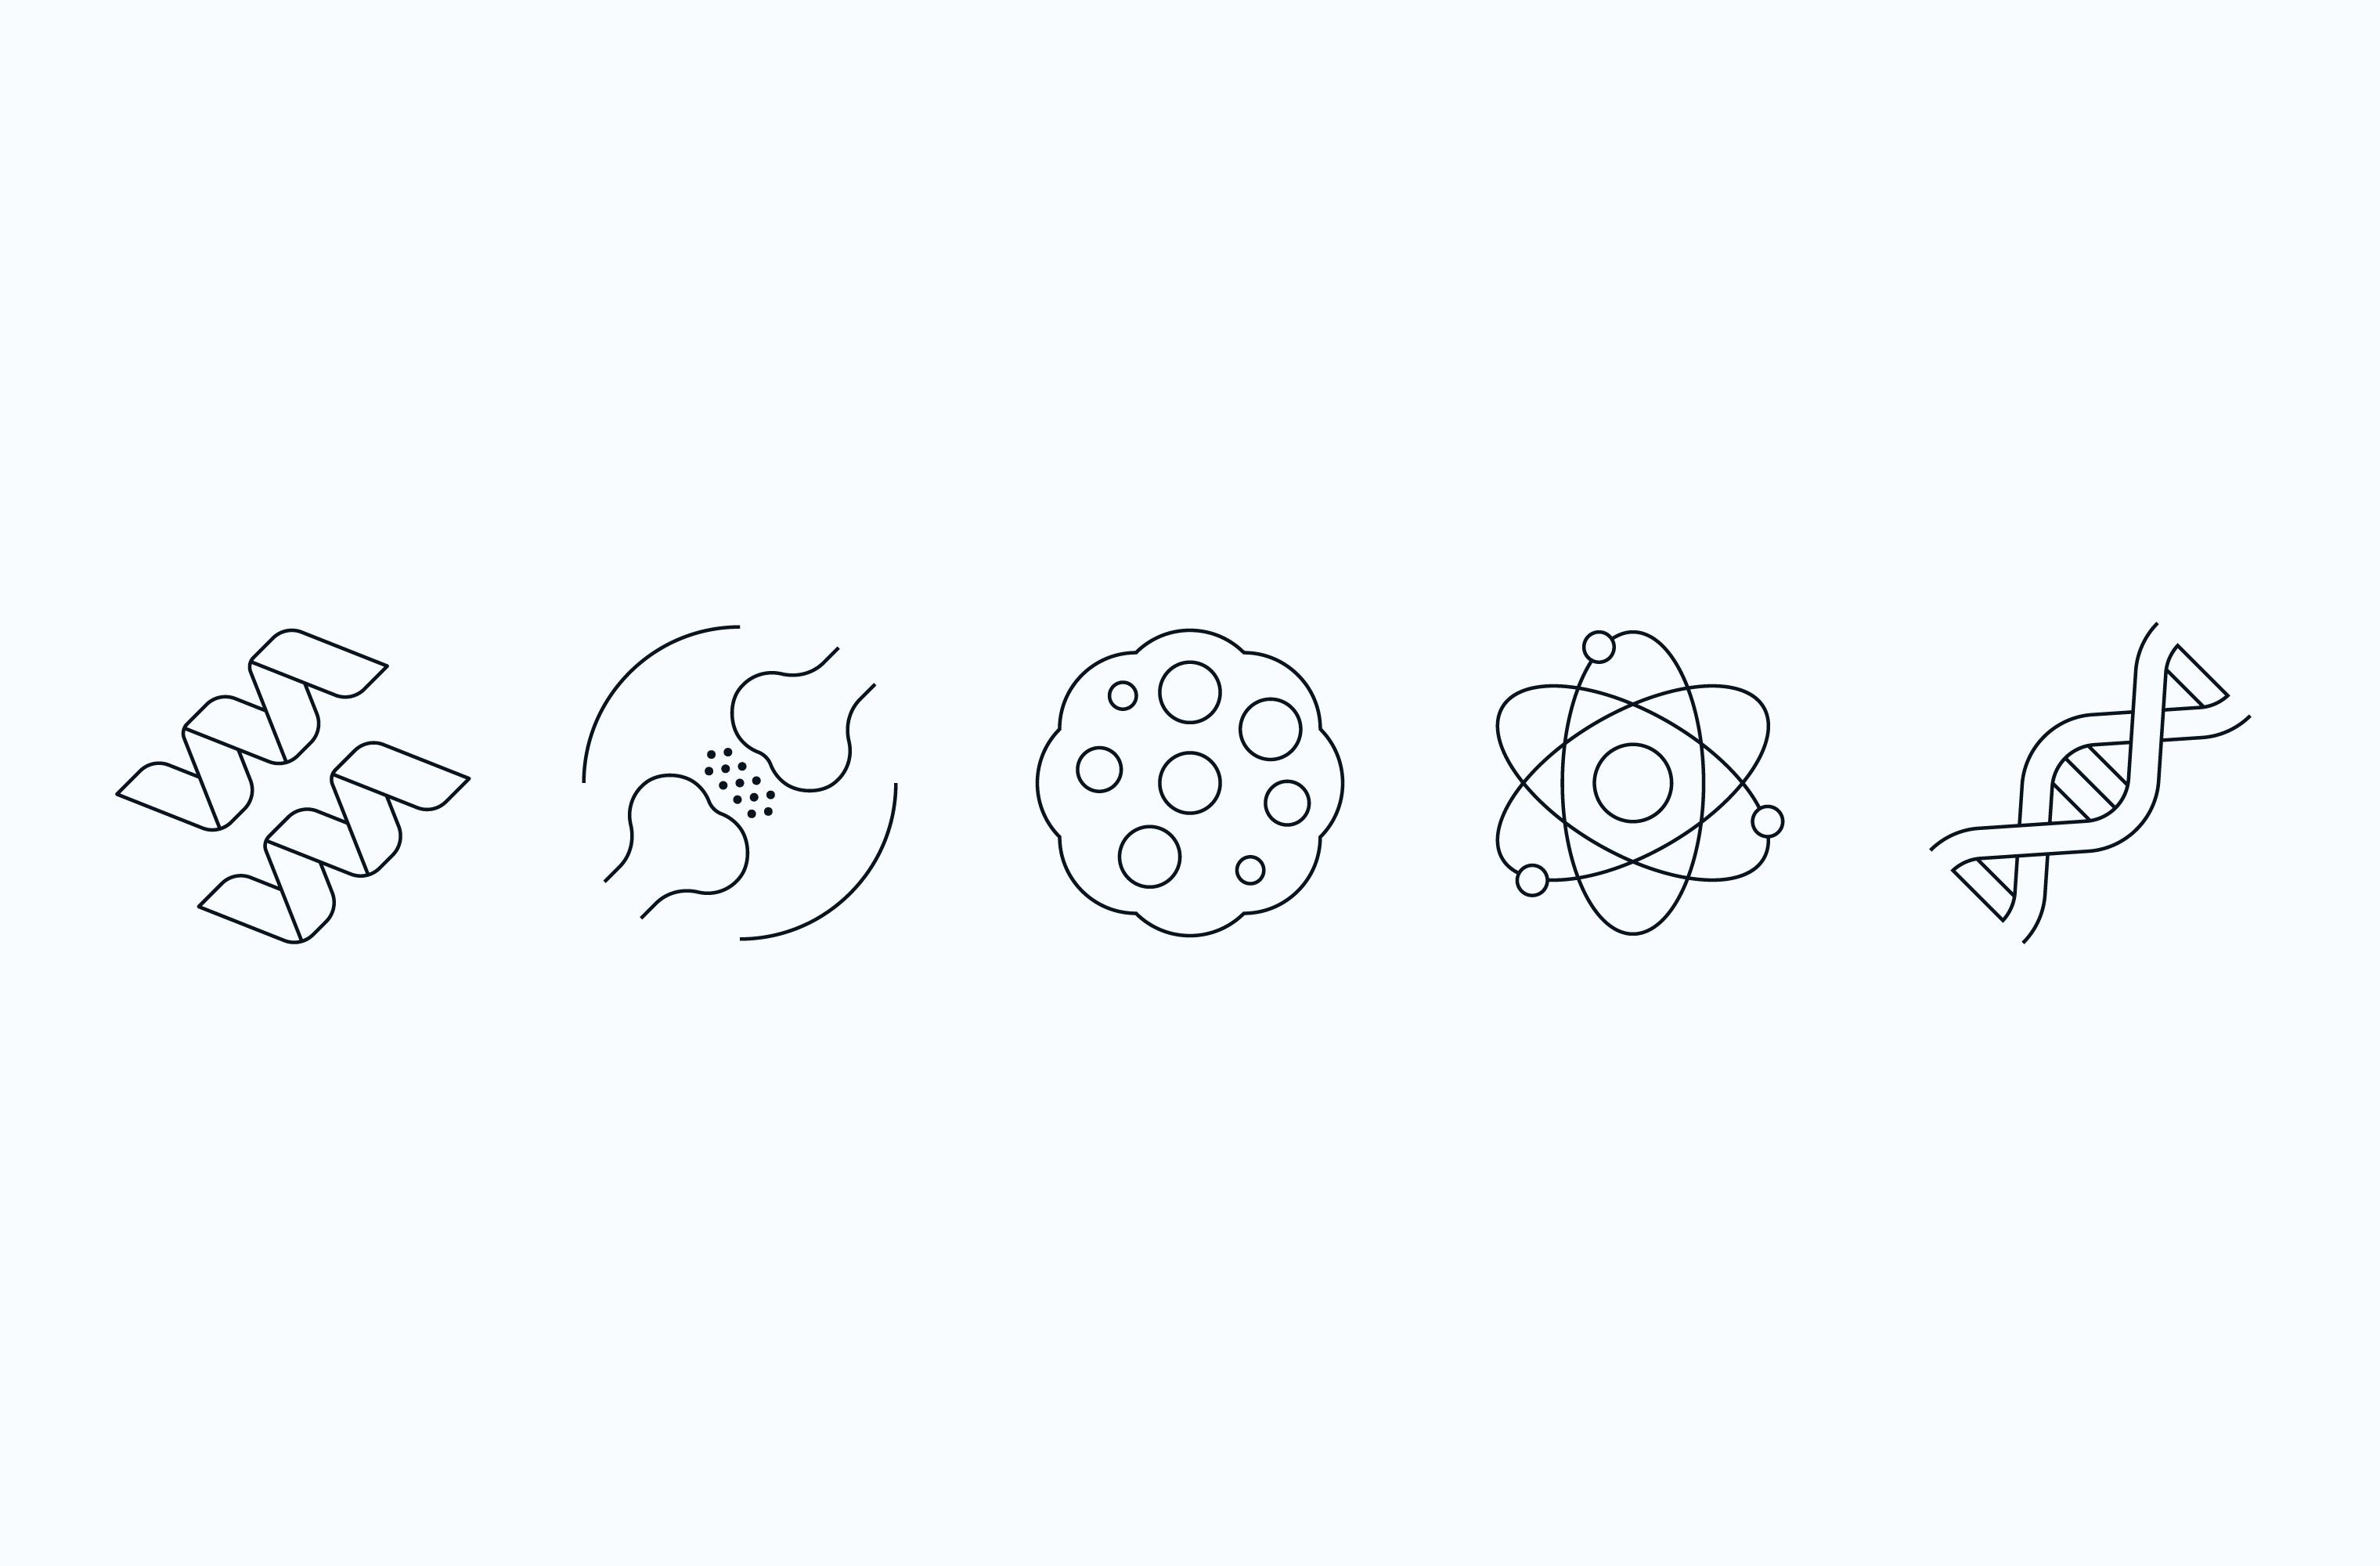 NYGC scientific icon set